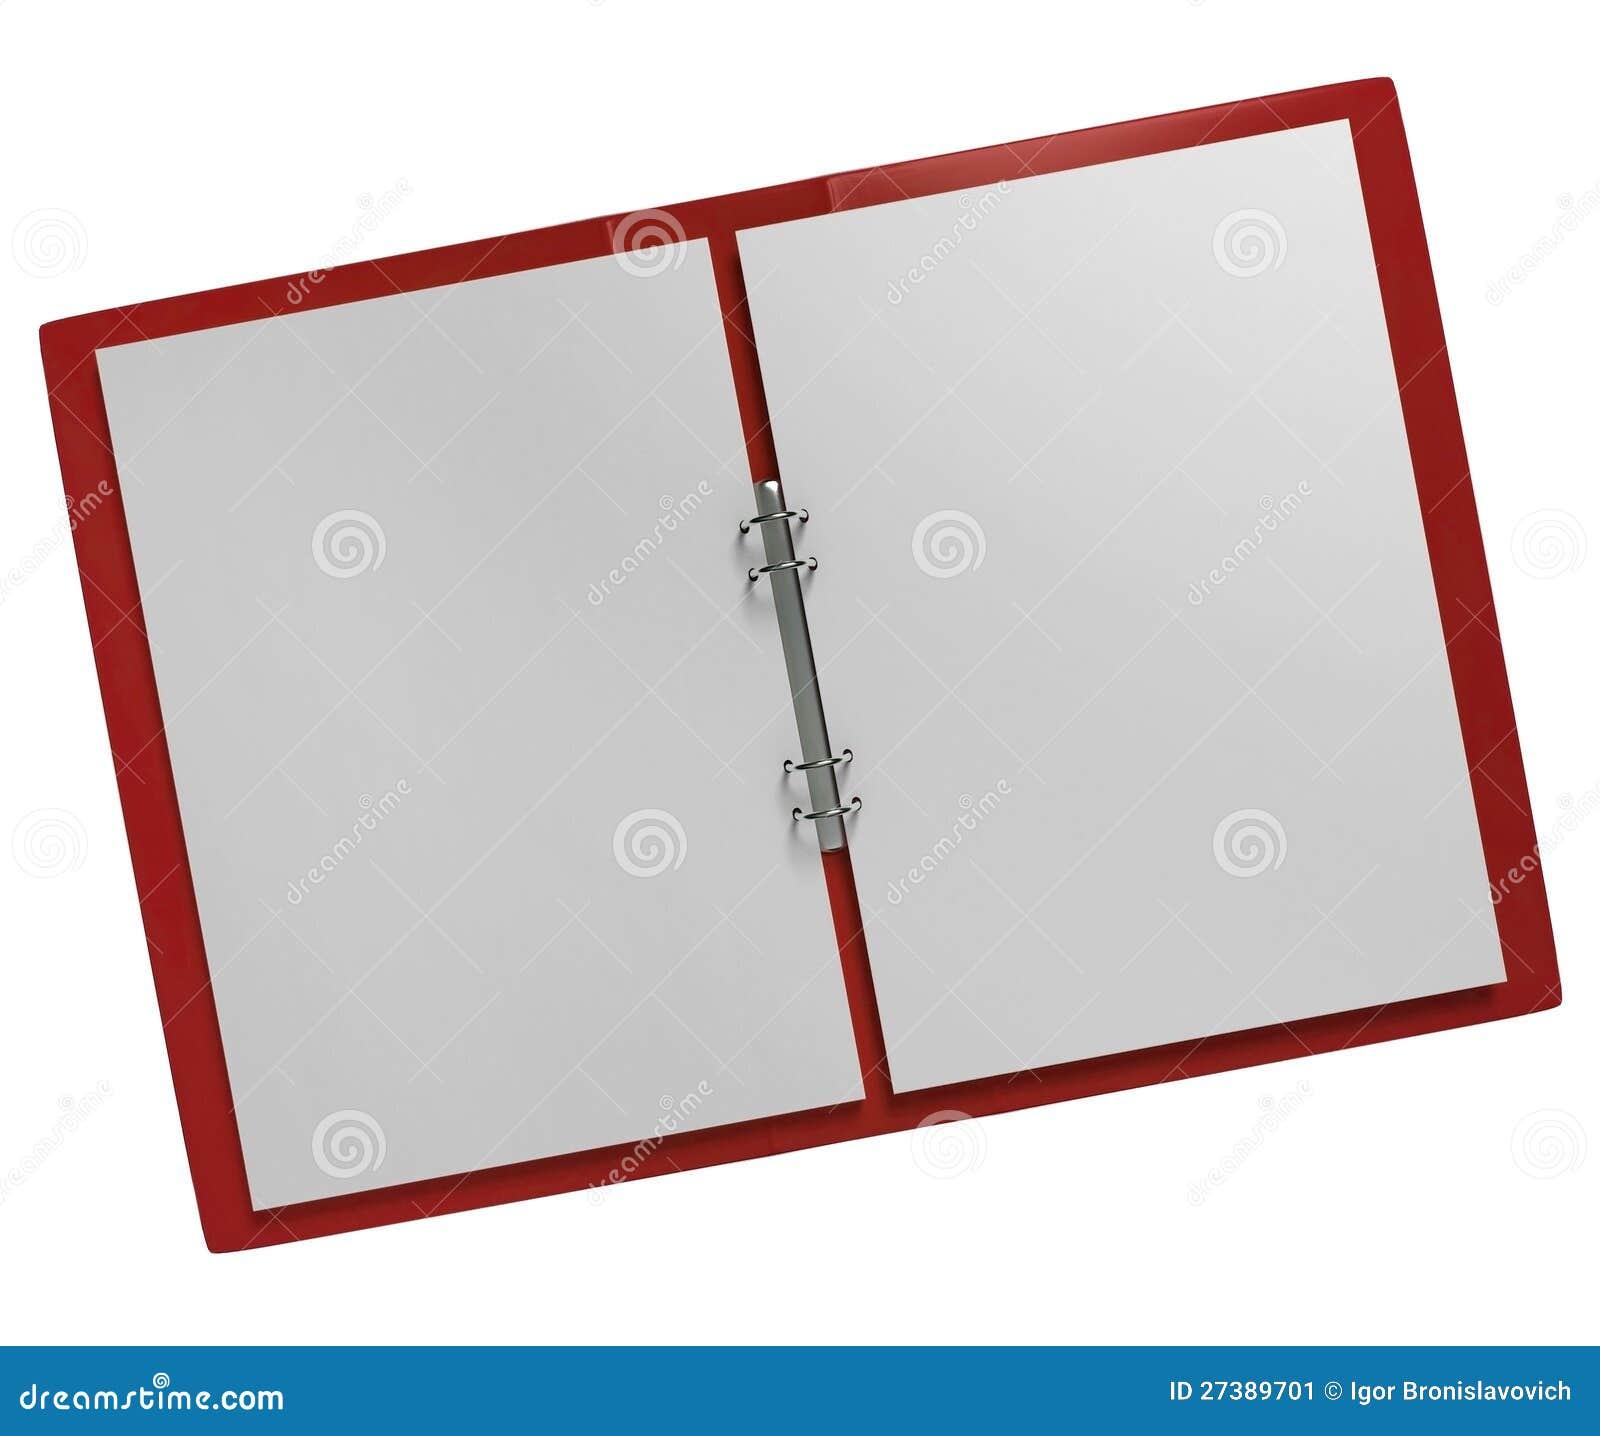 Opened Paper Folder Stock Image - Image: 27389701